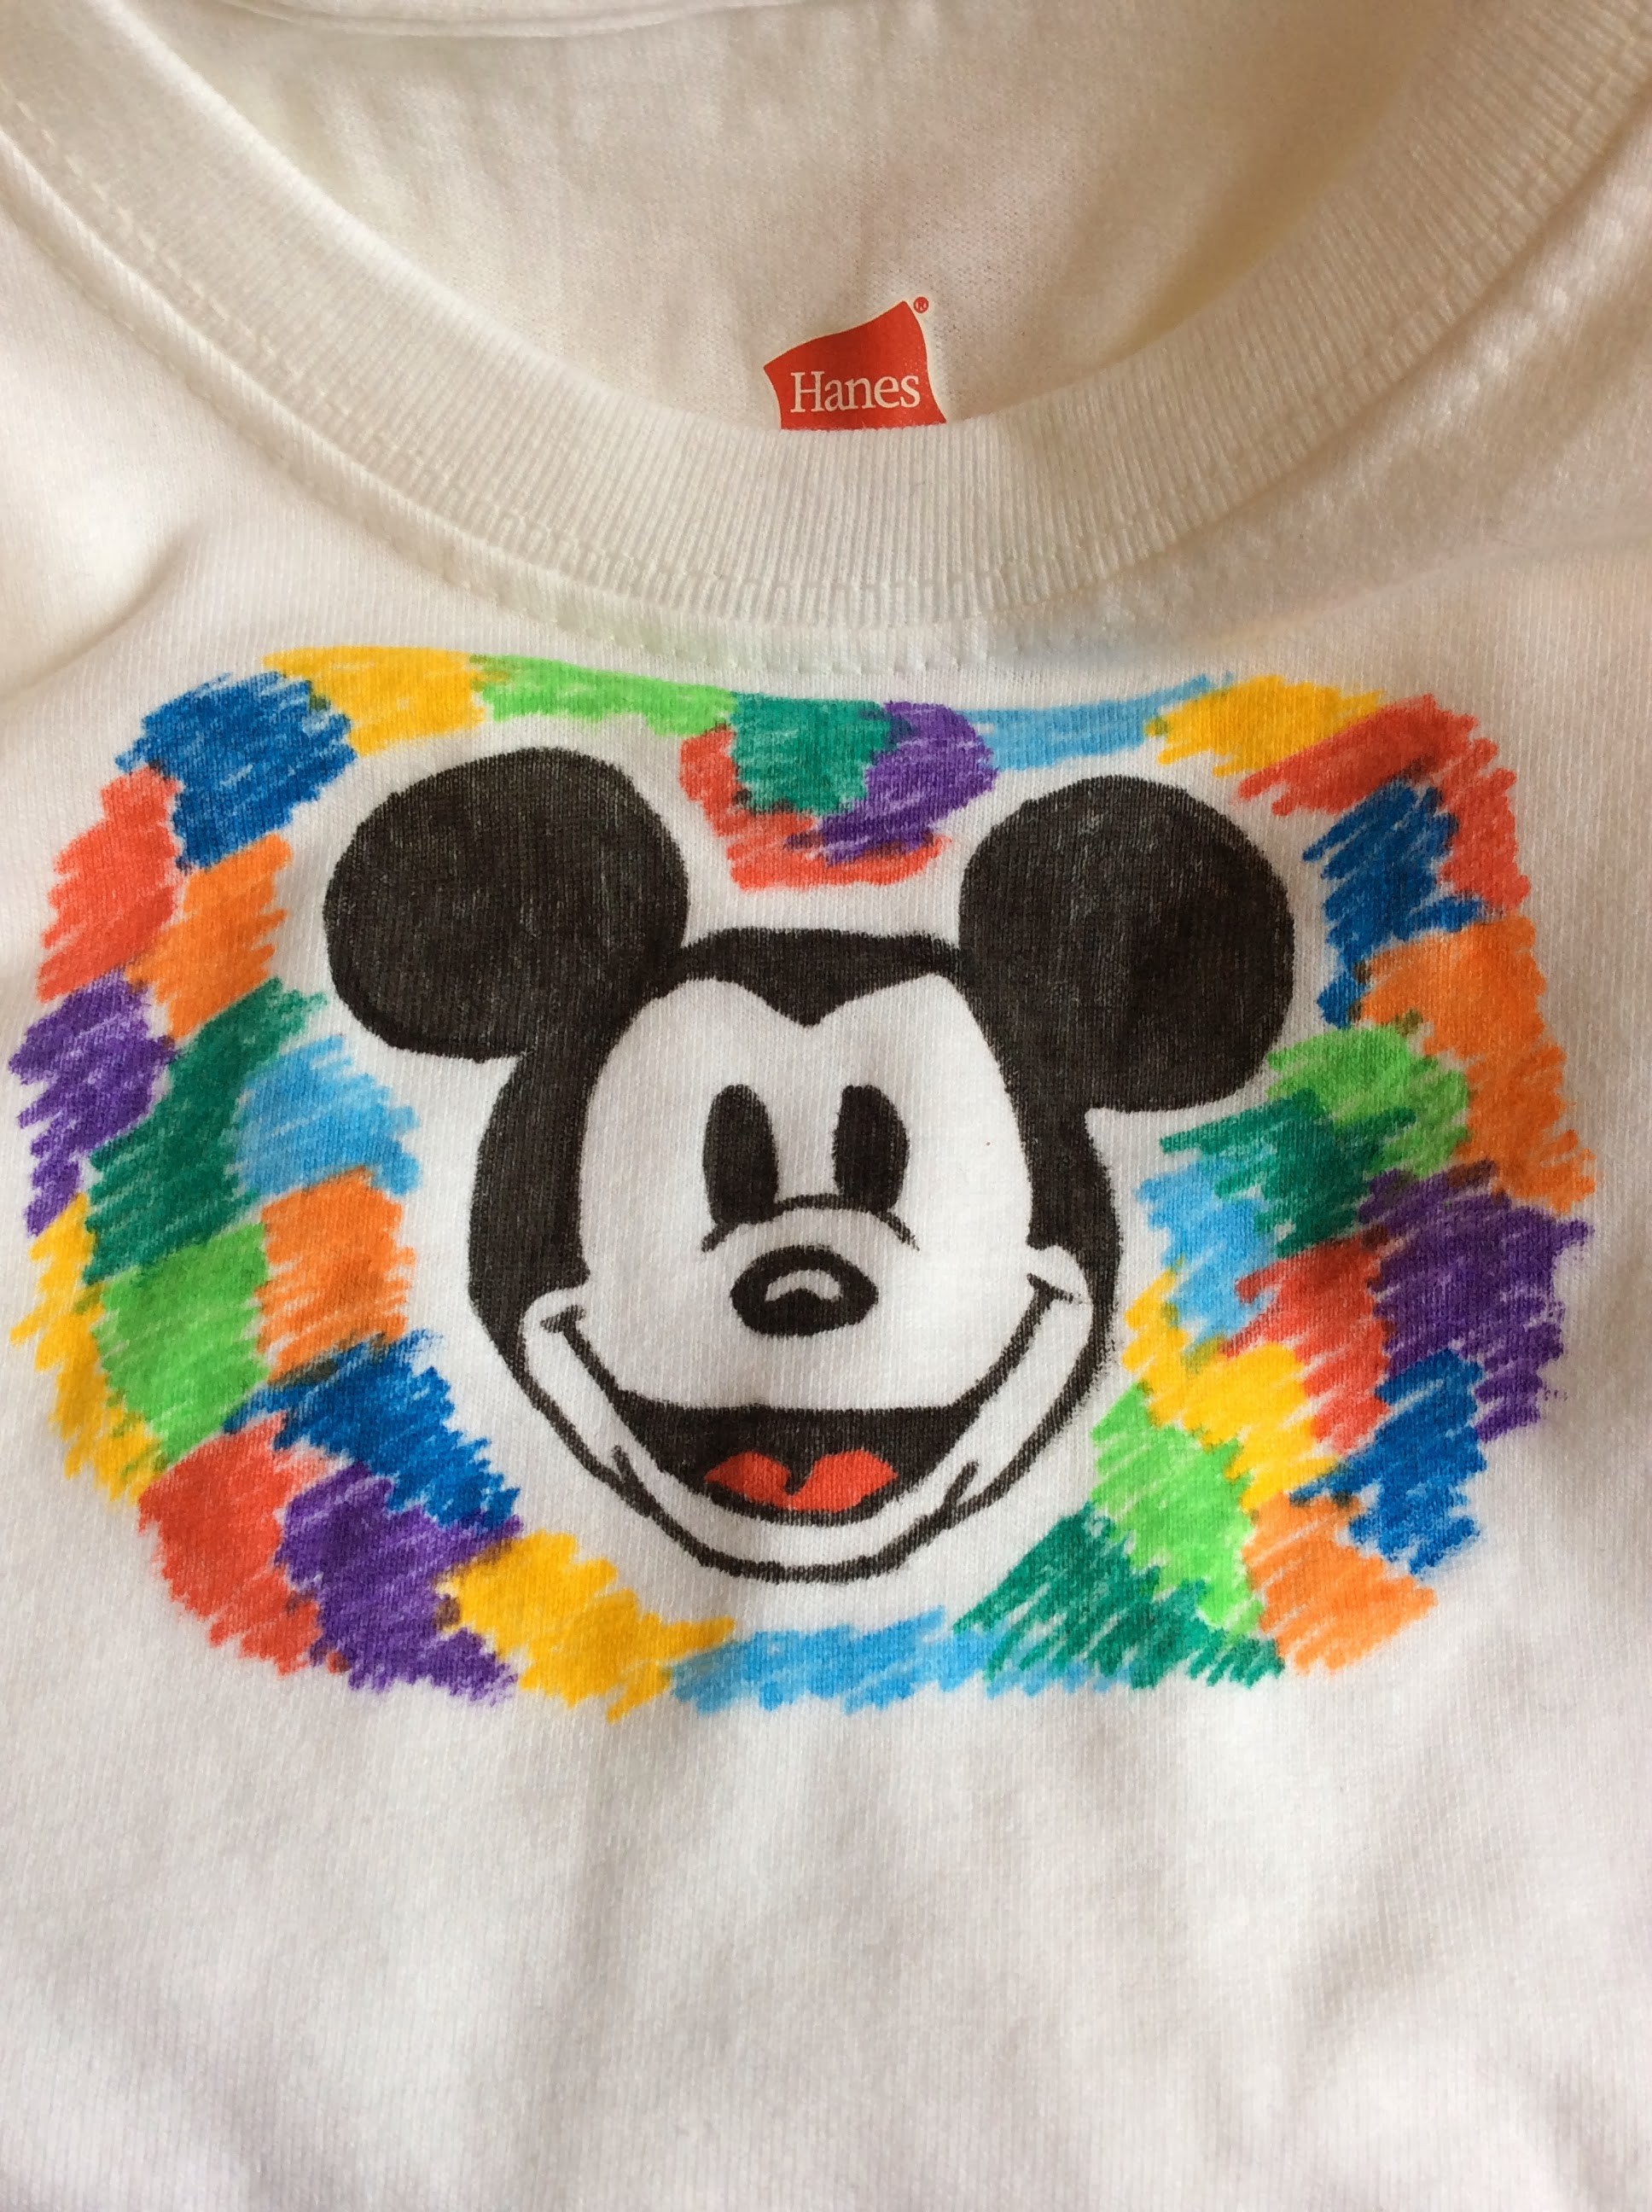 Hanes DisneySide shirt DIY